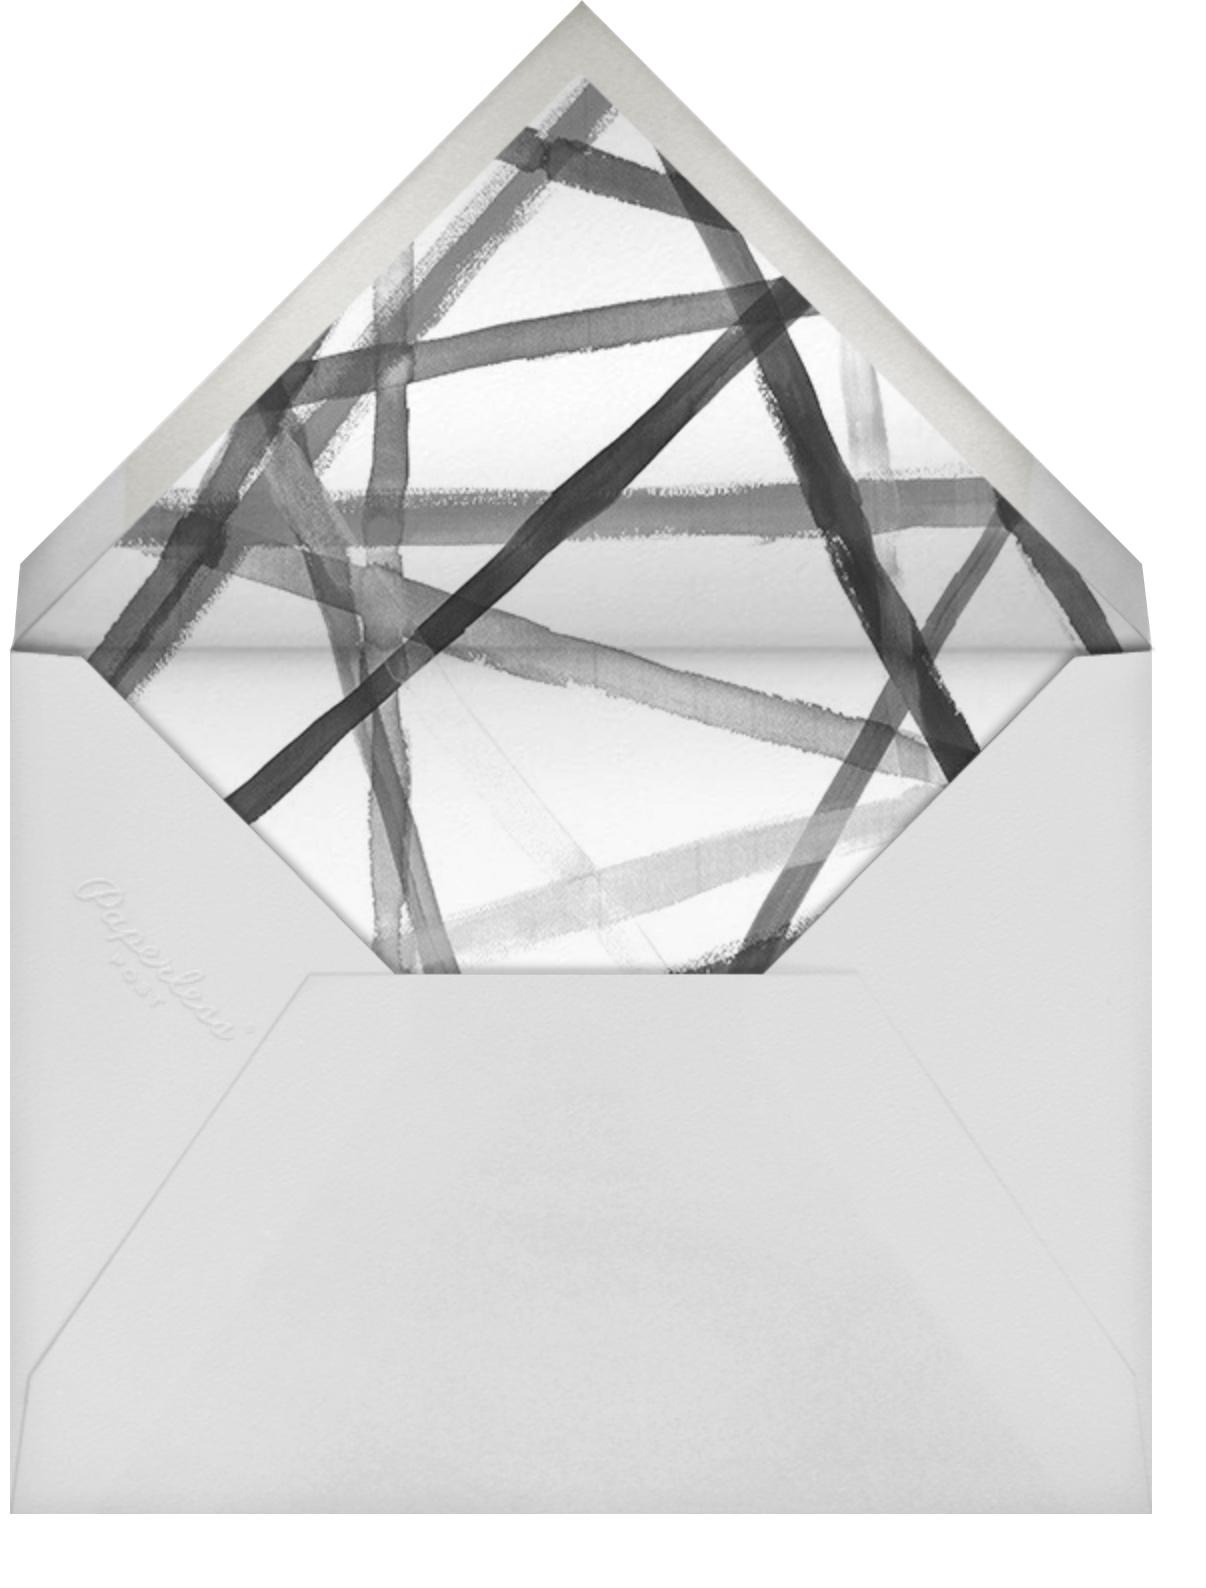 Channels (Stationery) - Navy - Kelly Wearstler - Personalized stationery - envelope back